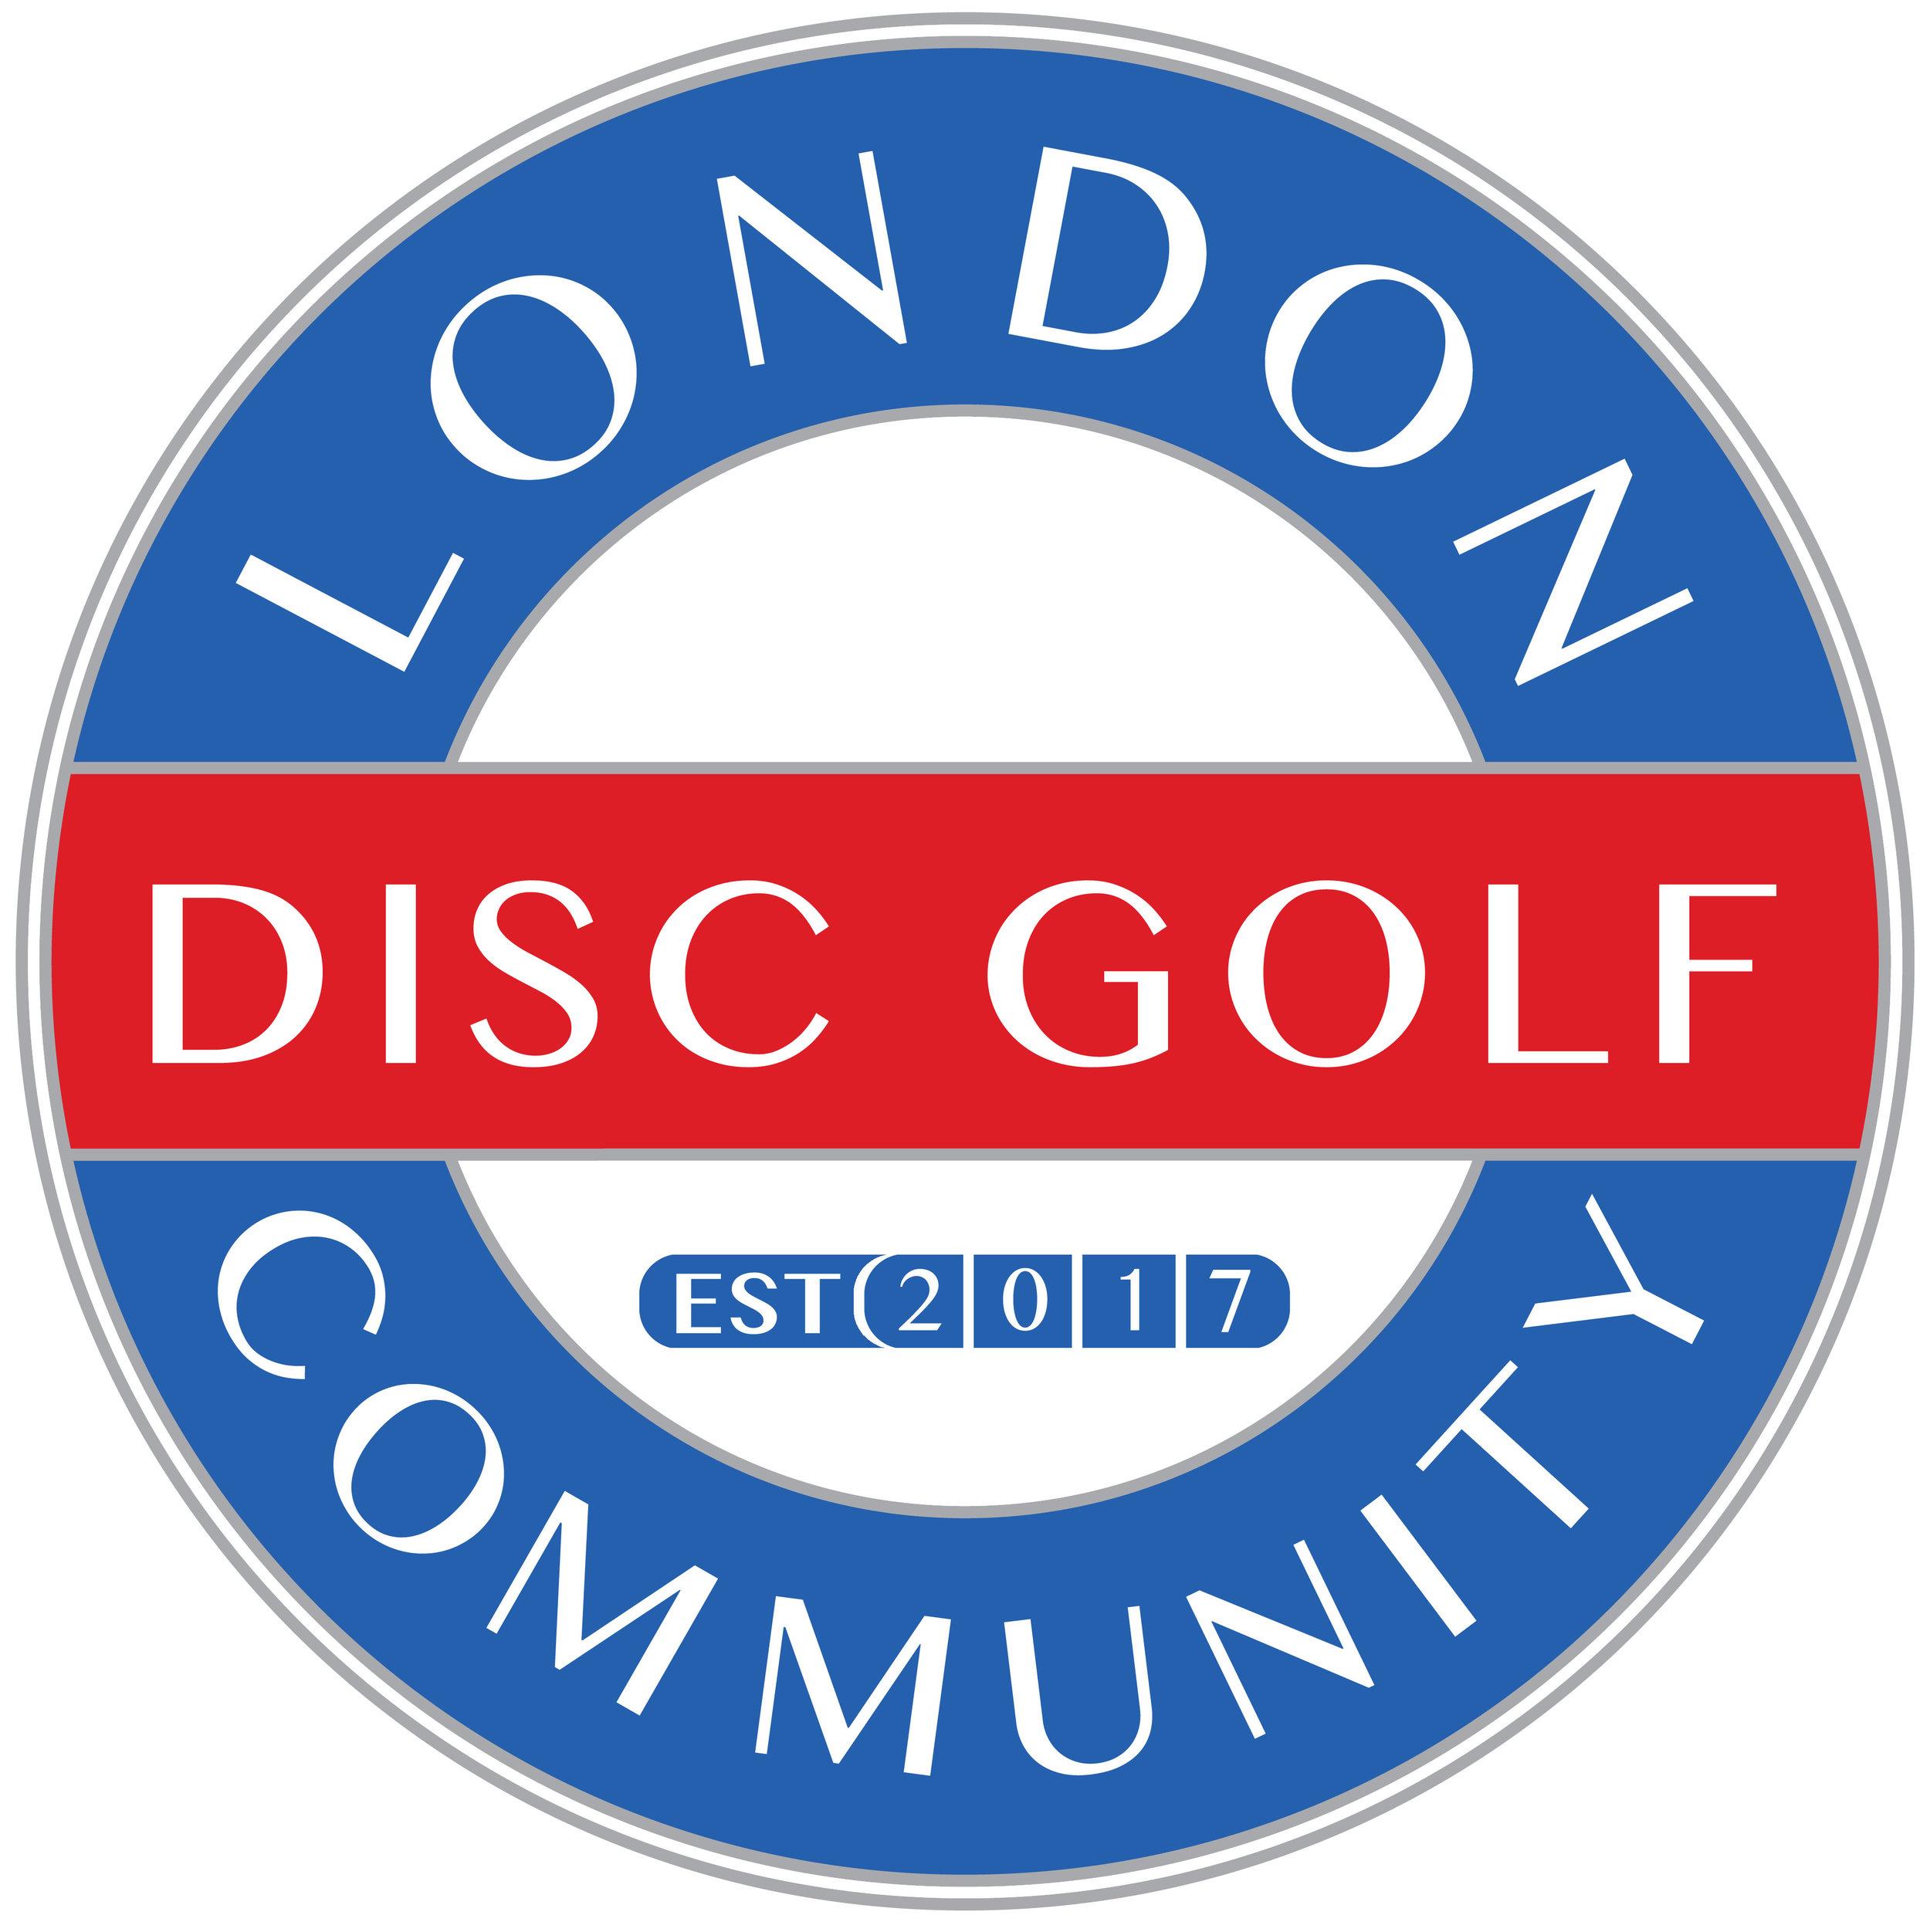 LDGC Logo 26.08.2018 Round .jpg